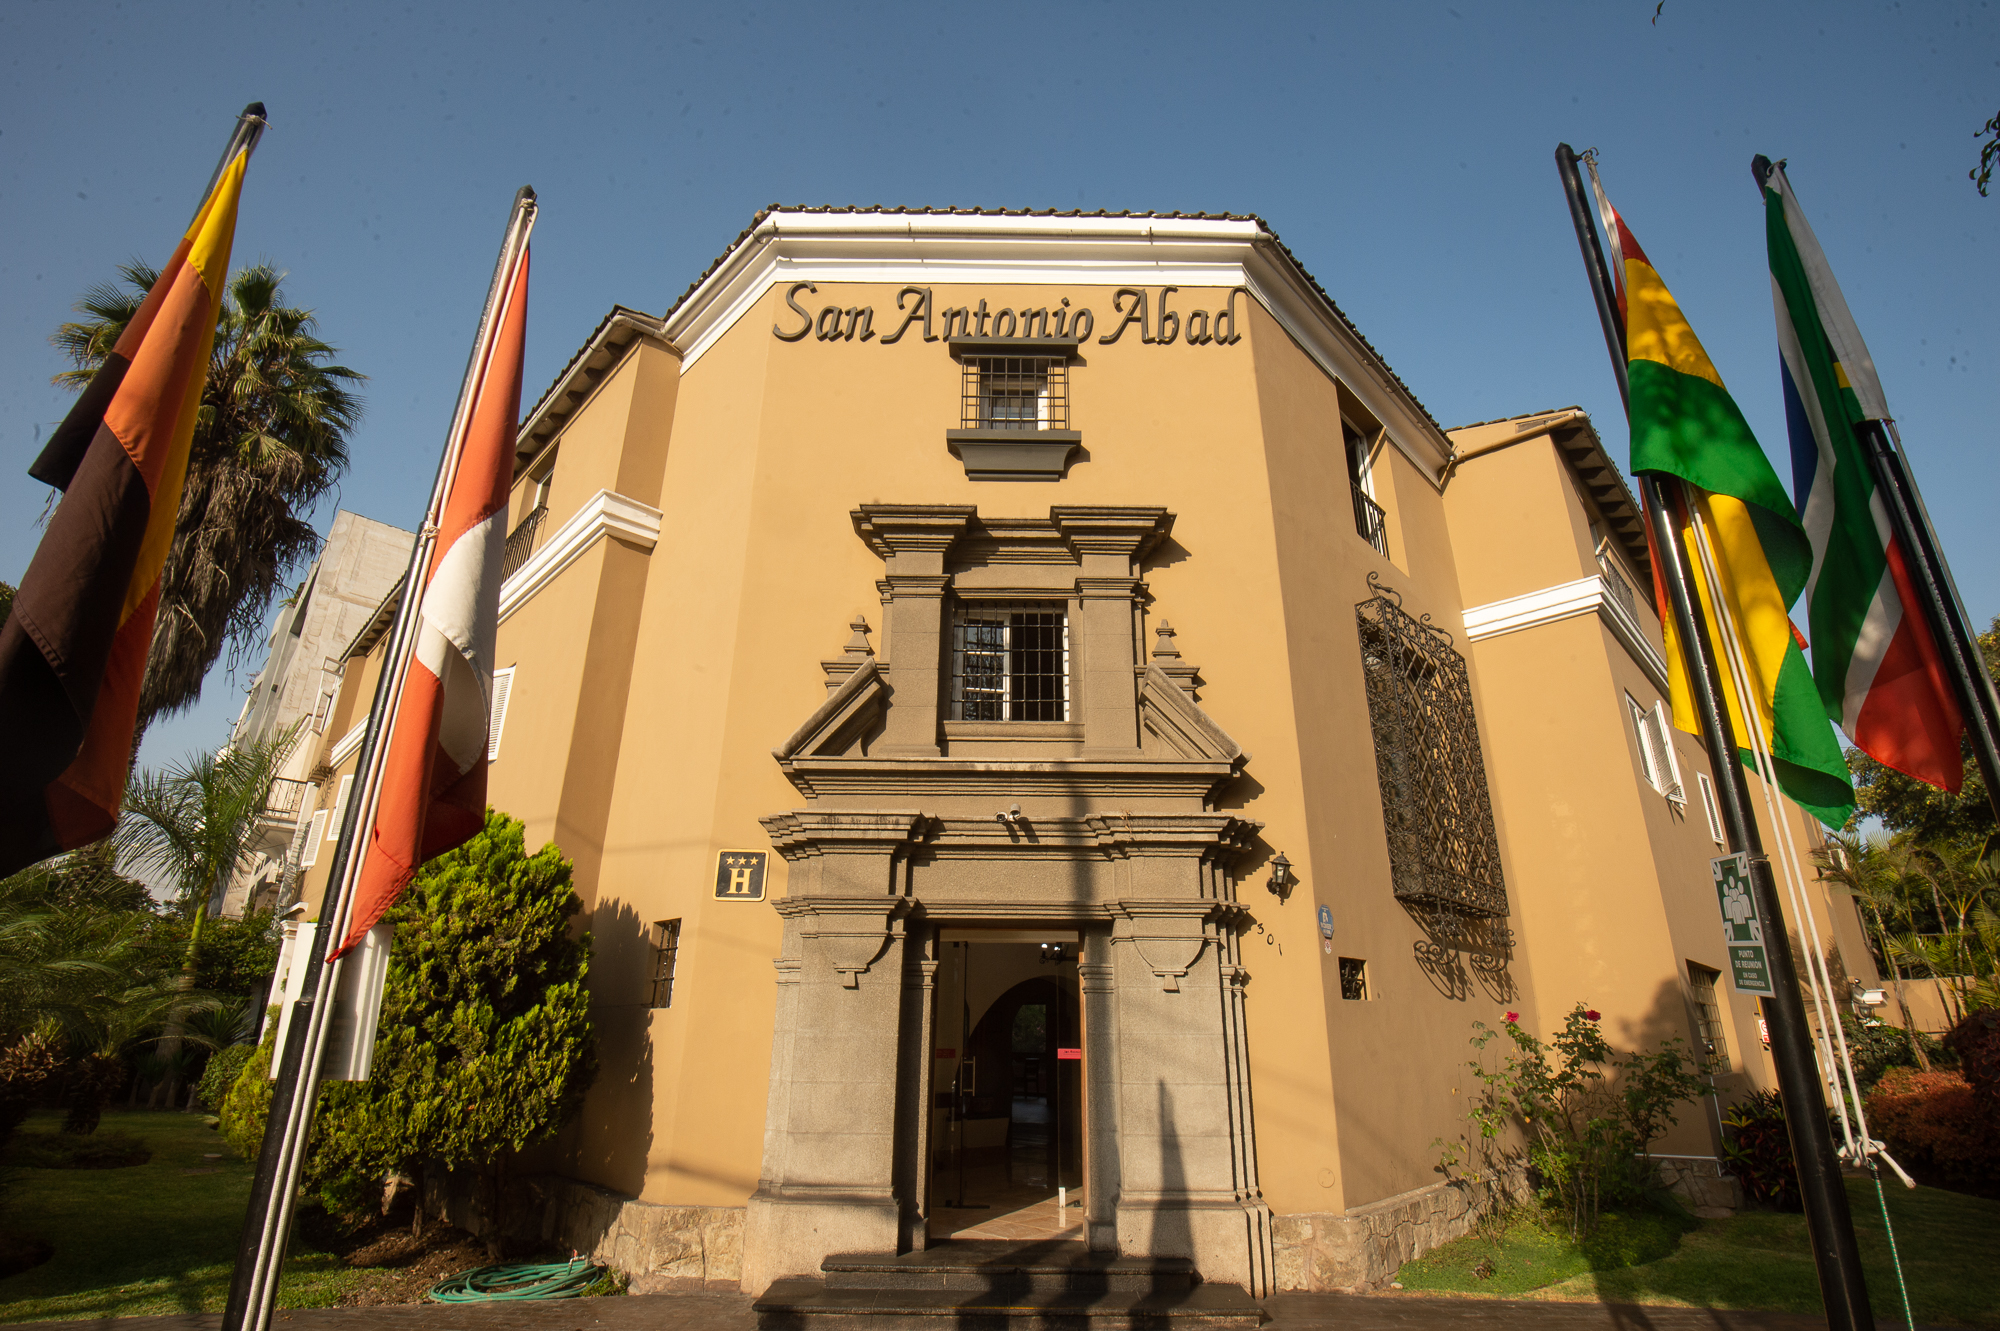 Hotel San Antonio Abad - Front View